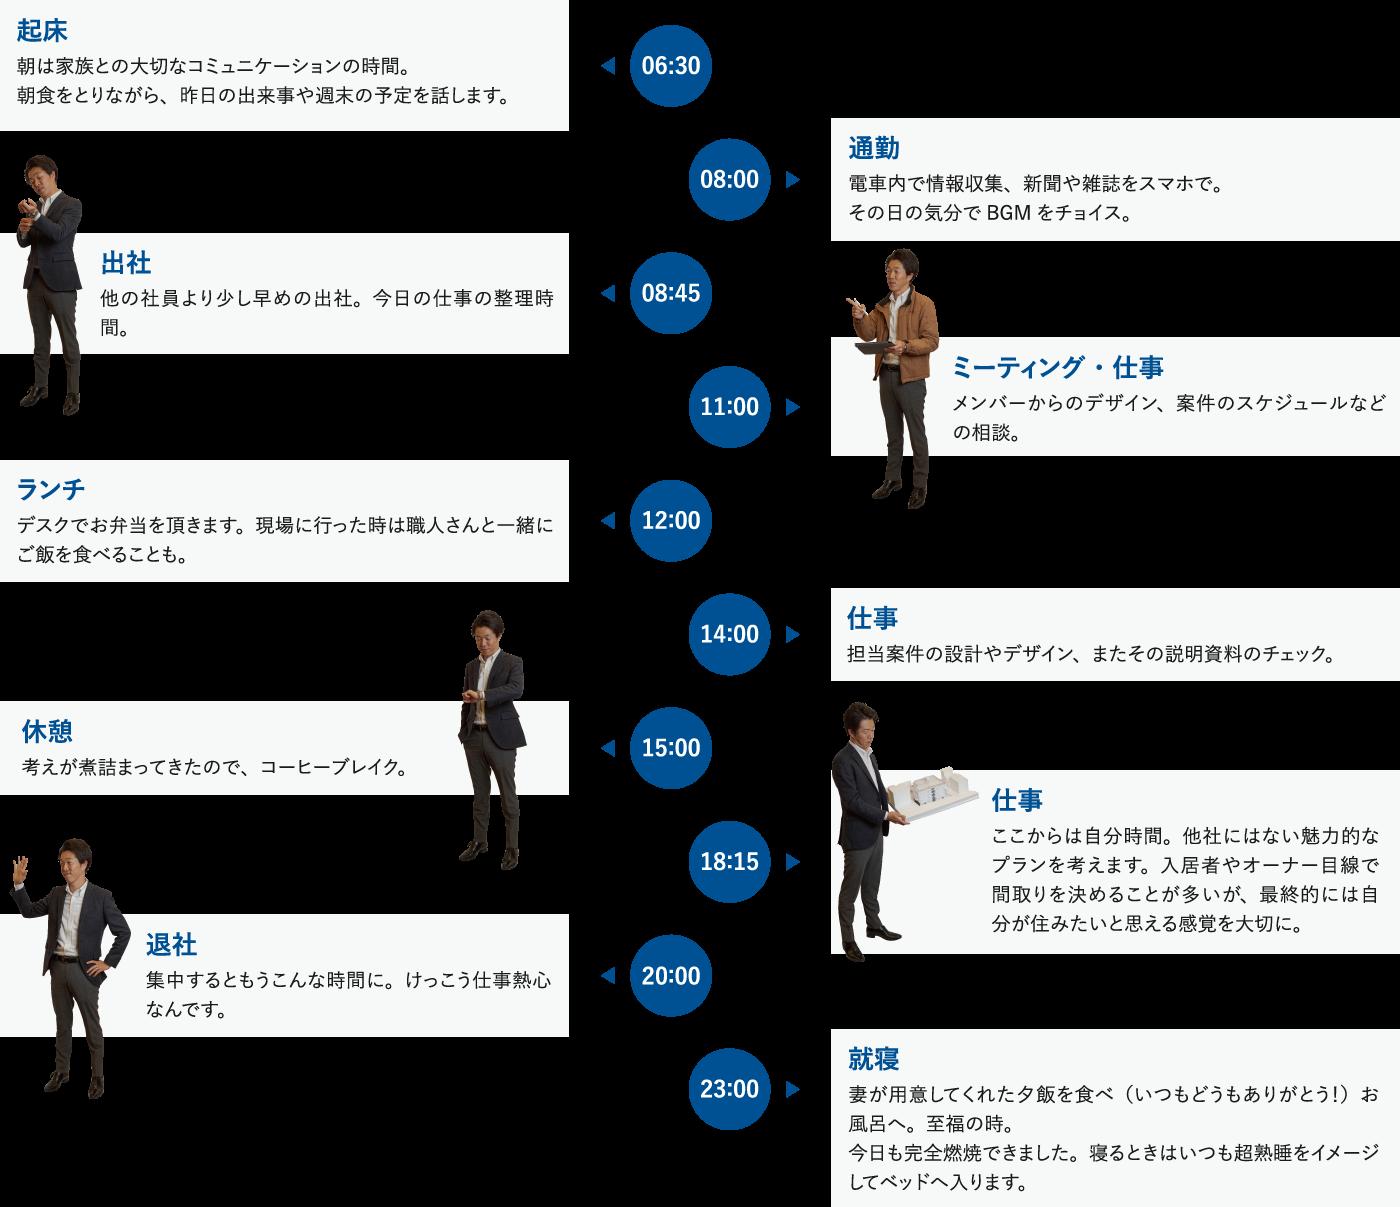 Shimada Work Style を体現する社員たち彼ら、彼女らの生声をお届けします